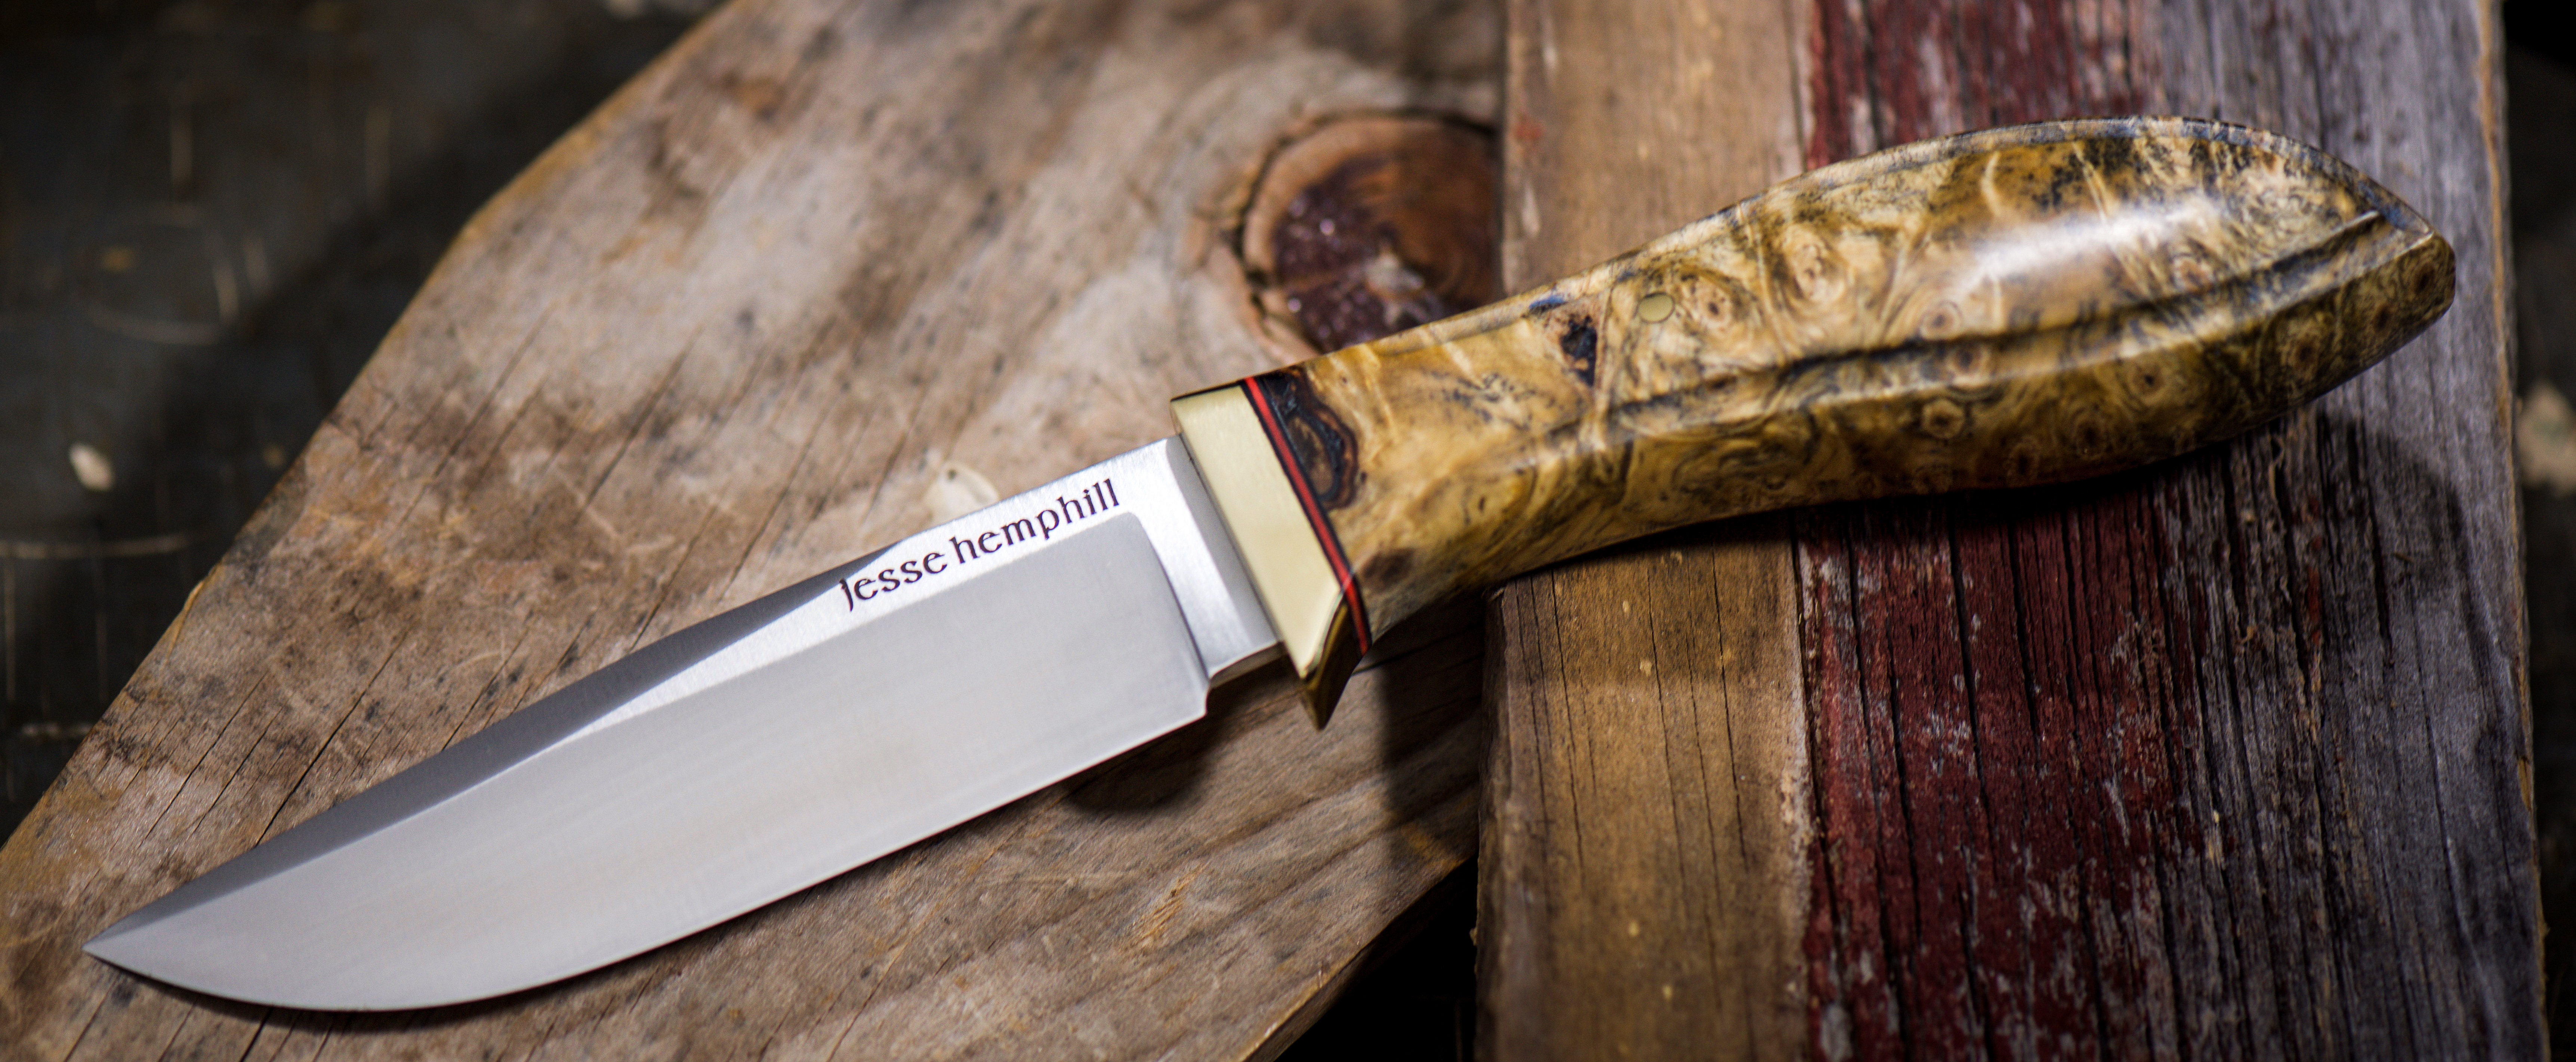 Jesse Hemphill Knives - Town Creek